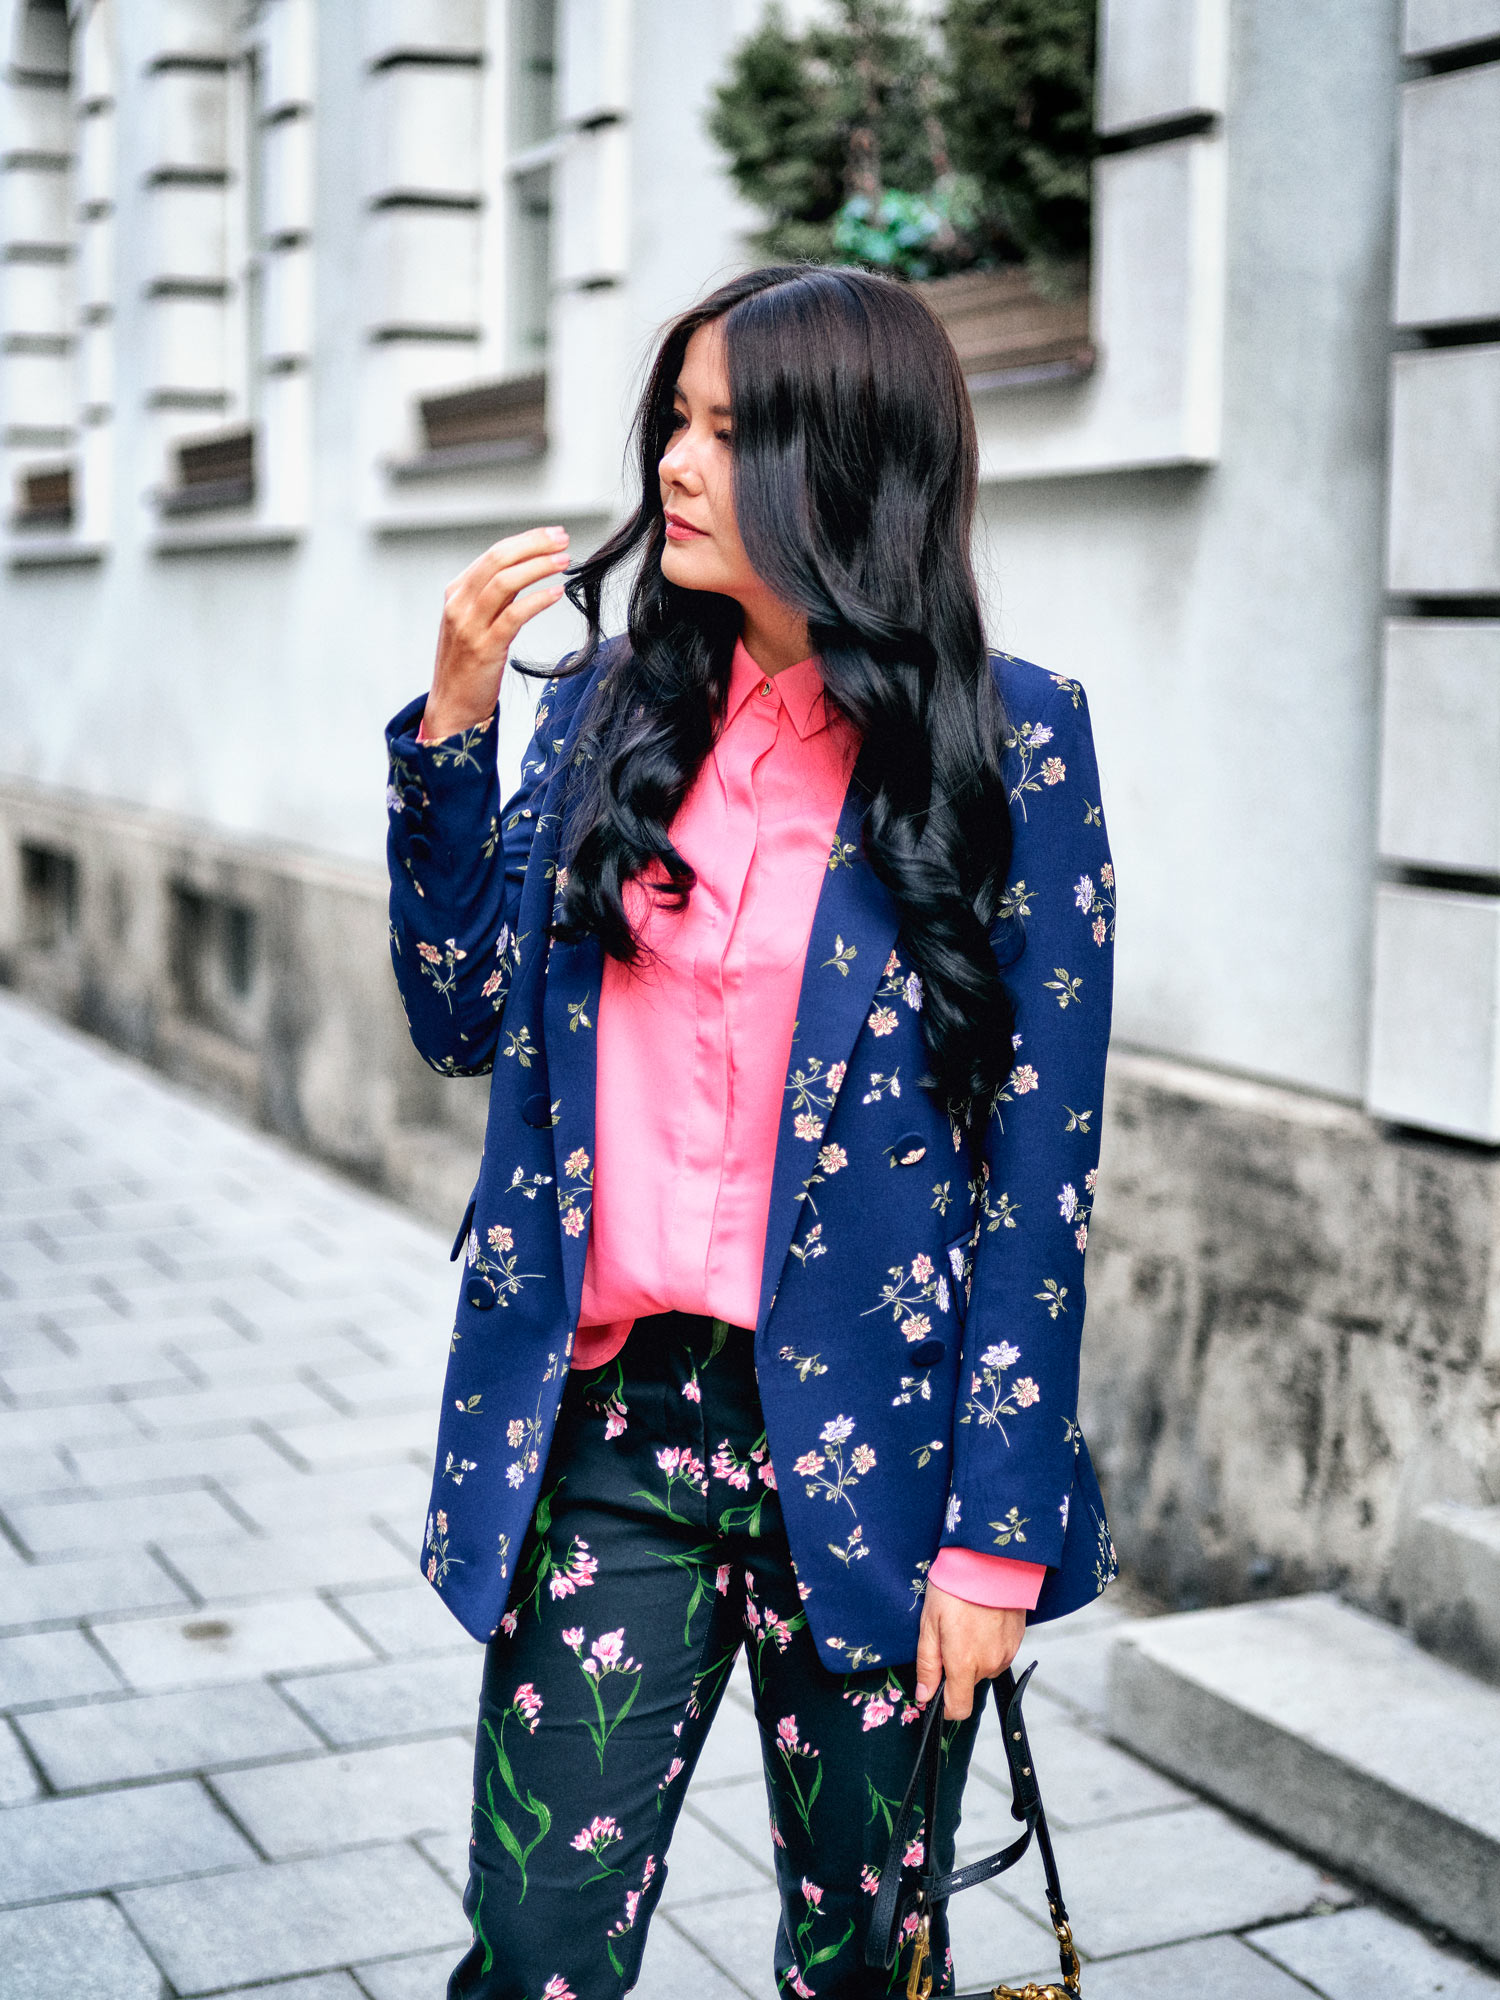 fashion-blogger-aus-muenchen-fashionblogger-lifestyleblogger-beautyblogger-fashion-blogger-modeblogger-modeblog-munich-blog-muenchen-flower-power-blumen-mustermix